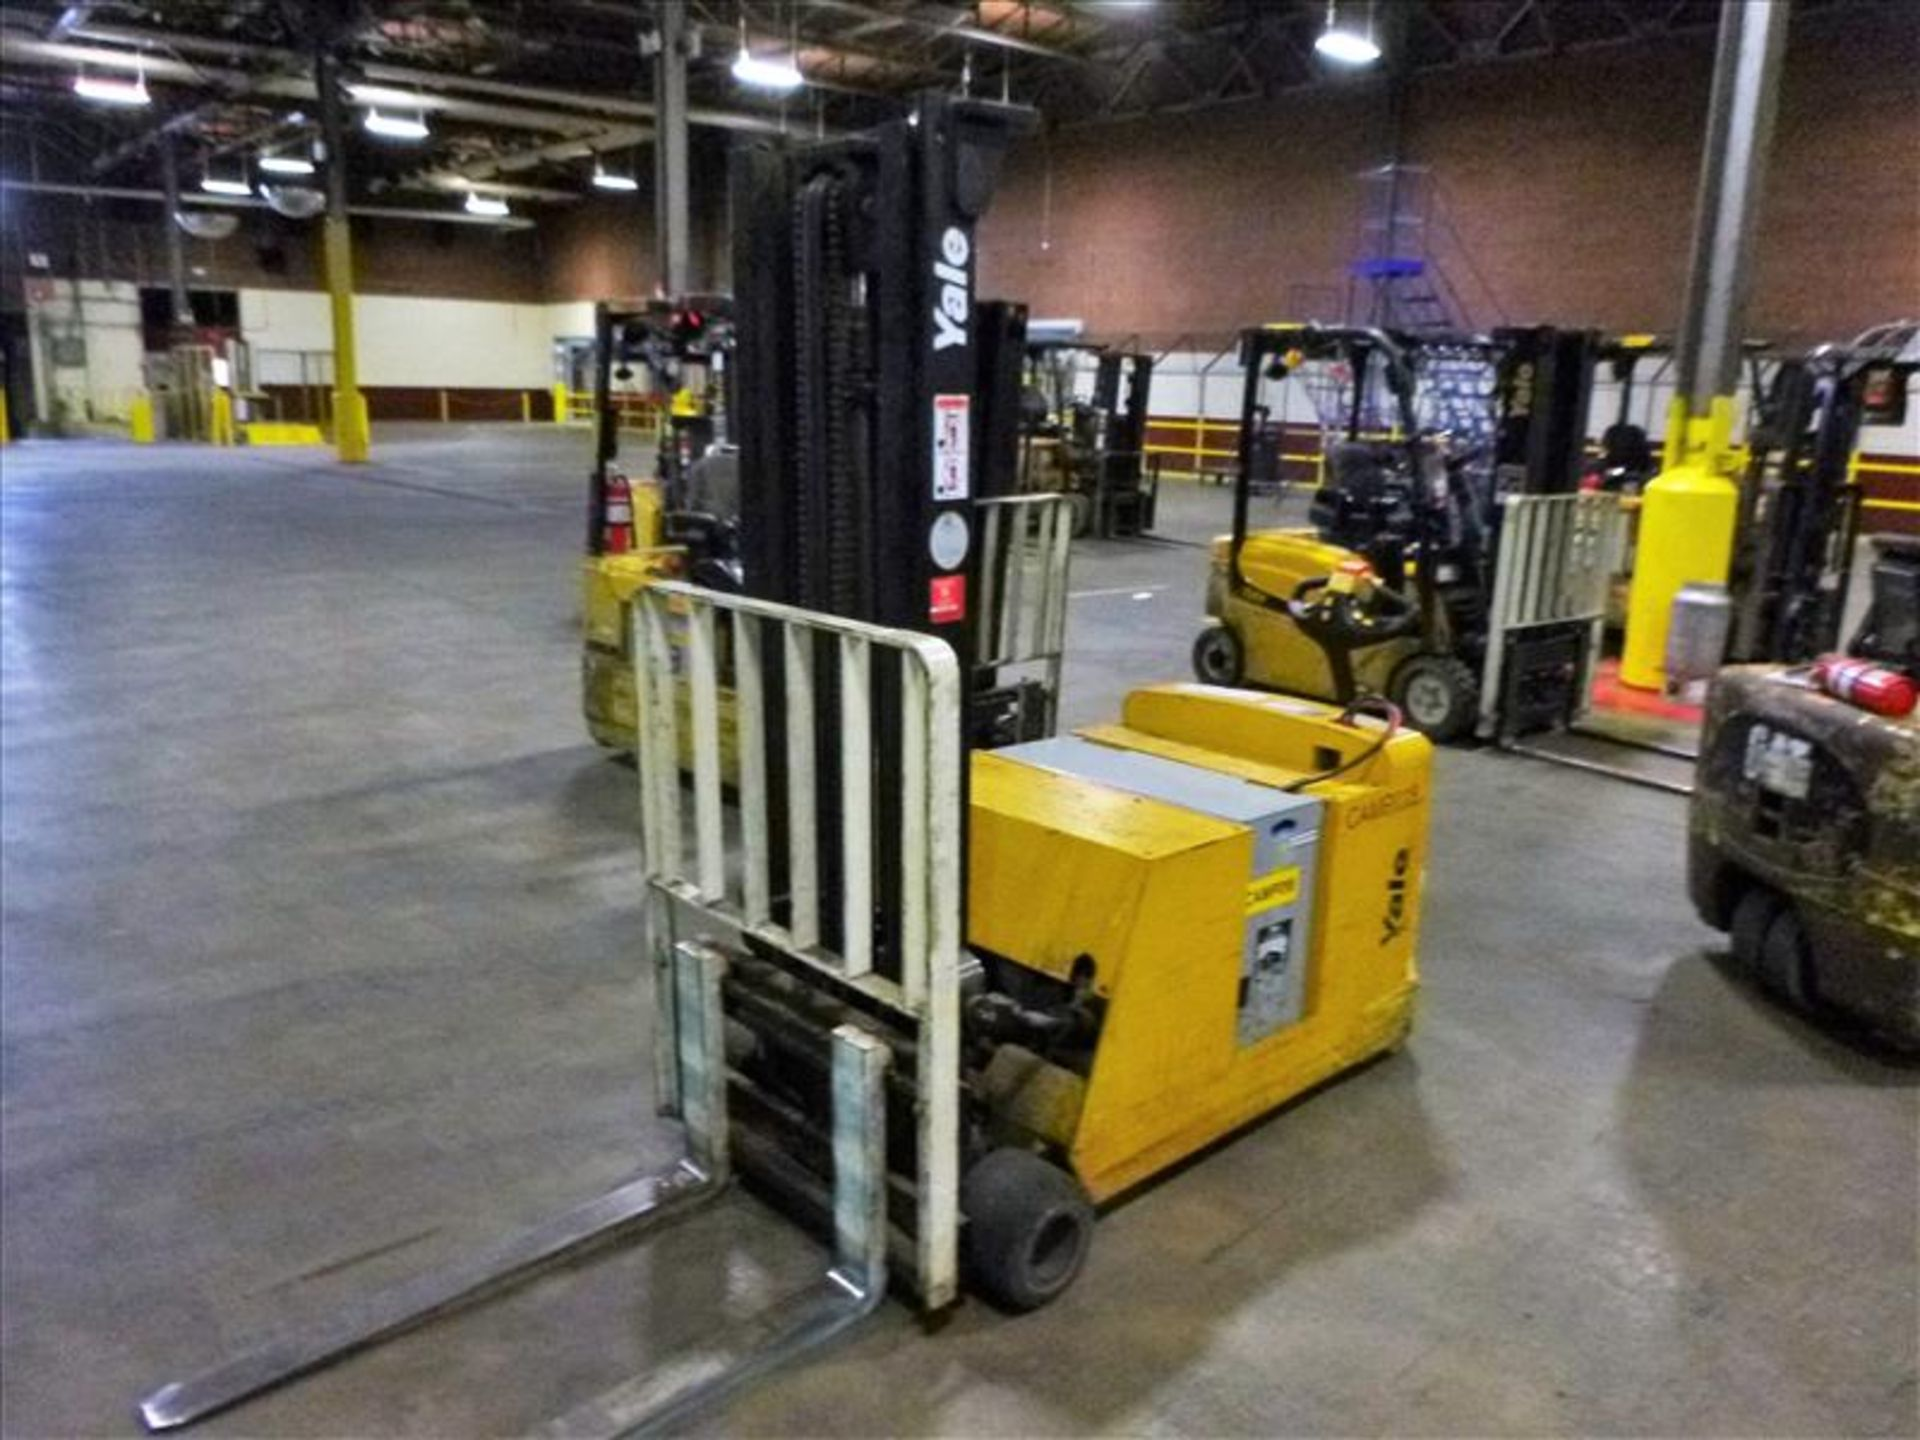 Lot 2024 - Yale walk-behind fork lift truck, mod. MCW040LEN24TV072, ser. no. C819N01591B, 24V electric, 3700